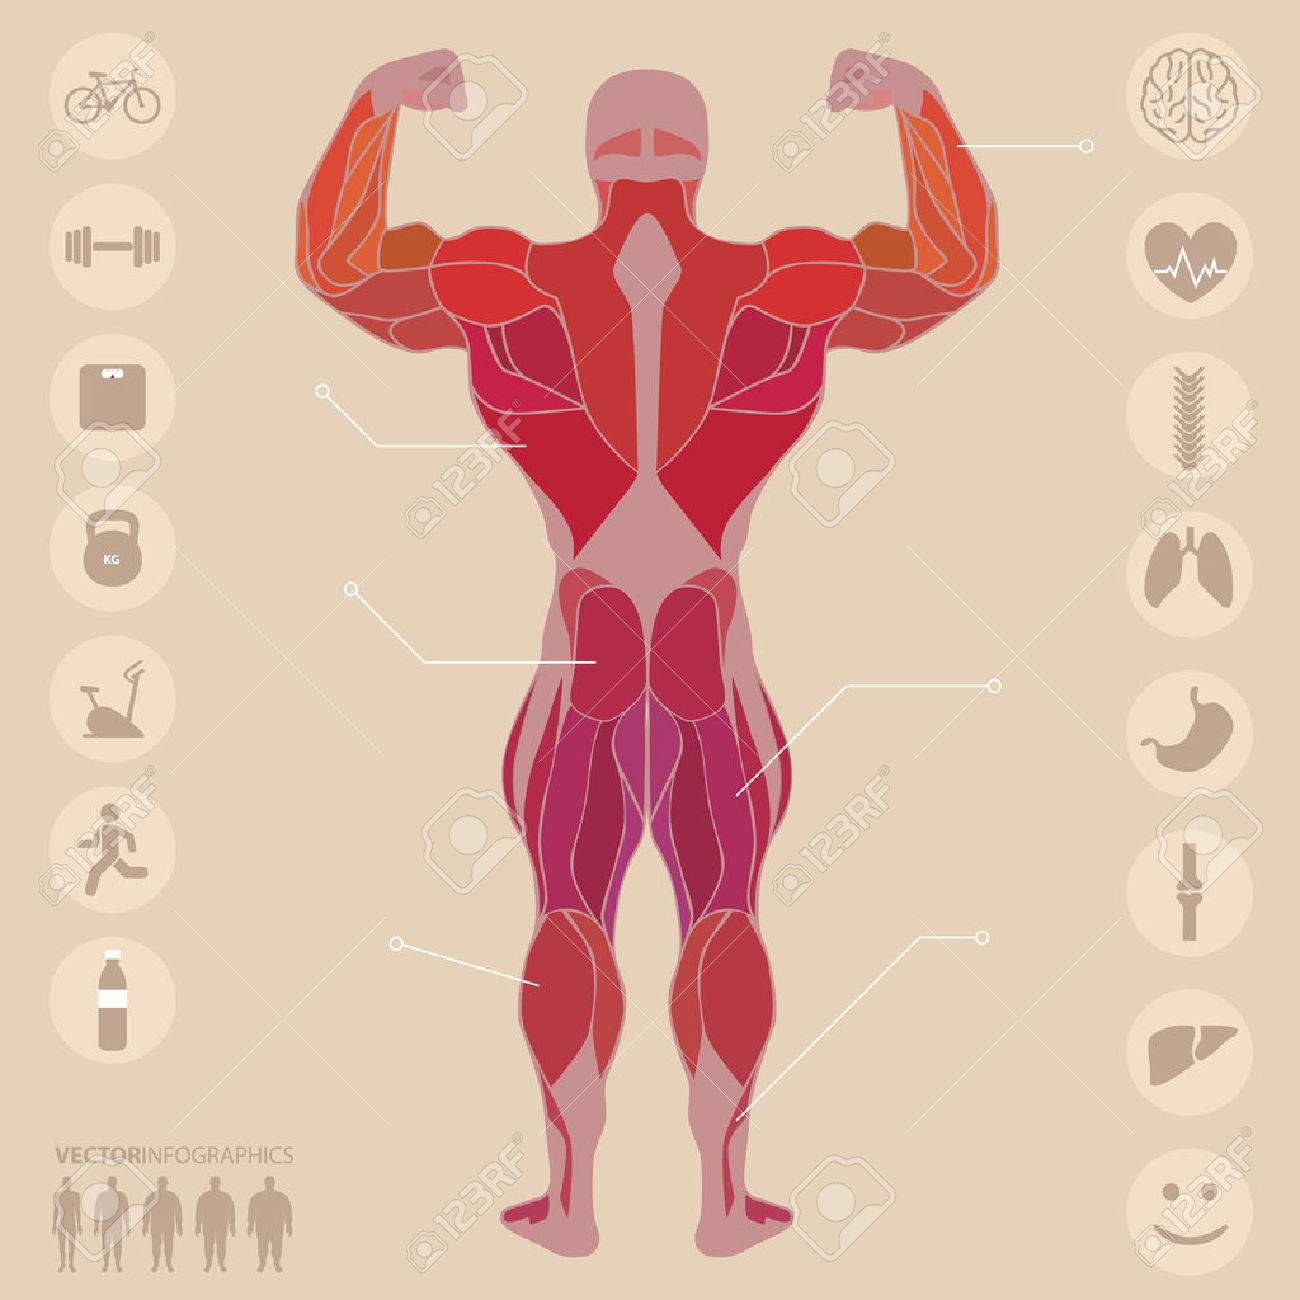 Mensch, Anatomie, Muskeln, Rücken, Sport, Fitness, Medizin ...